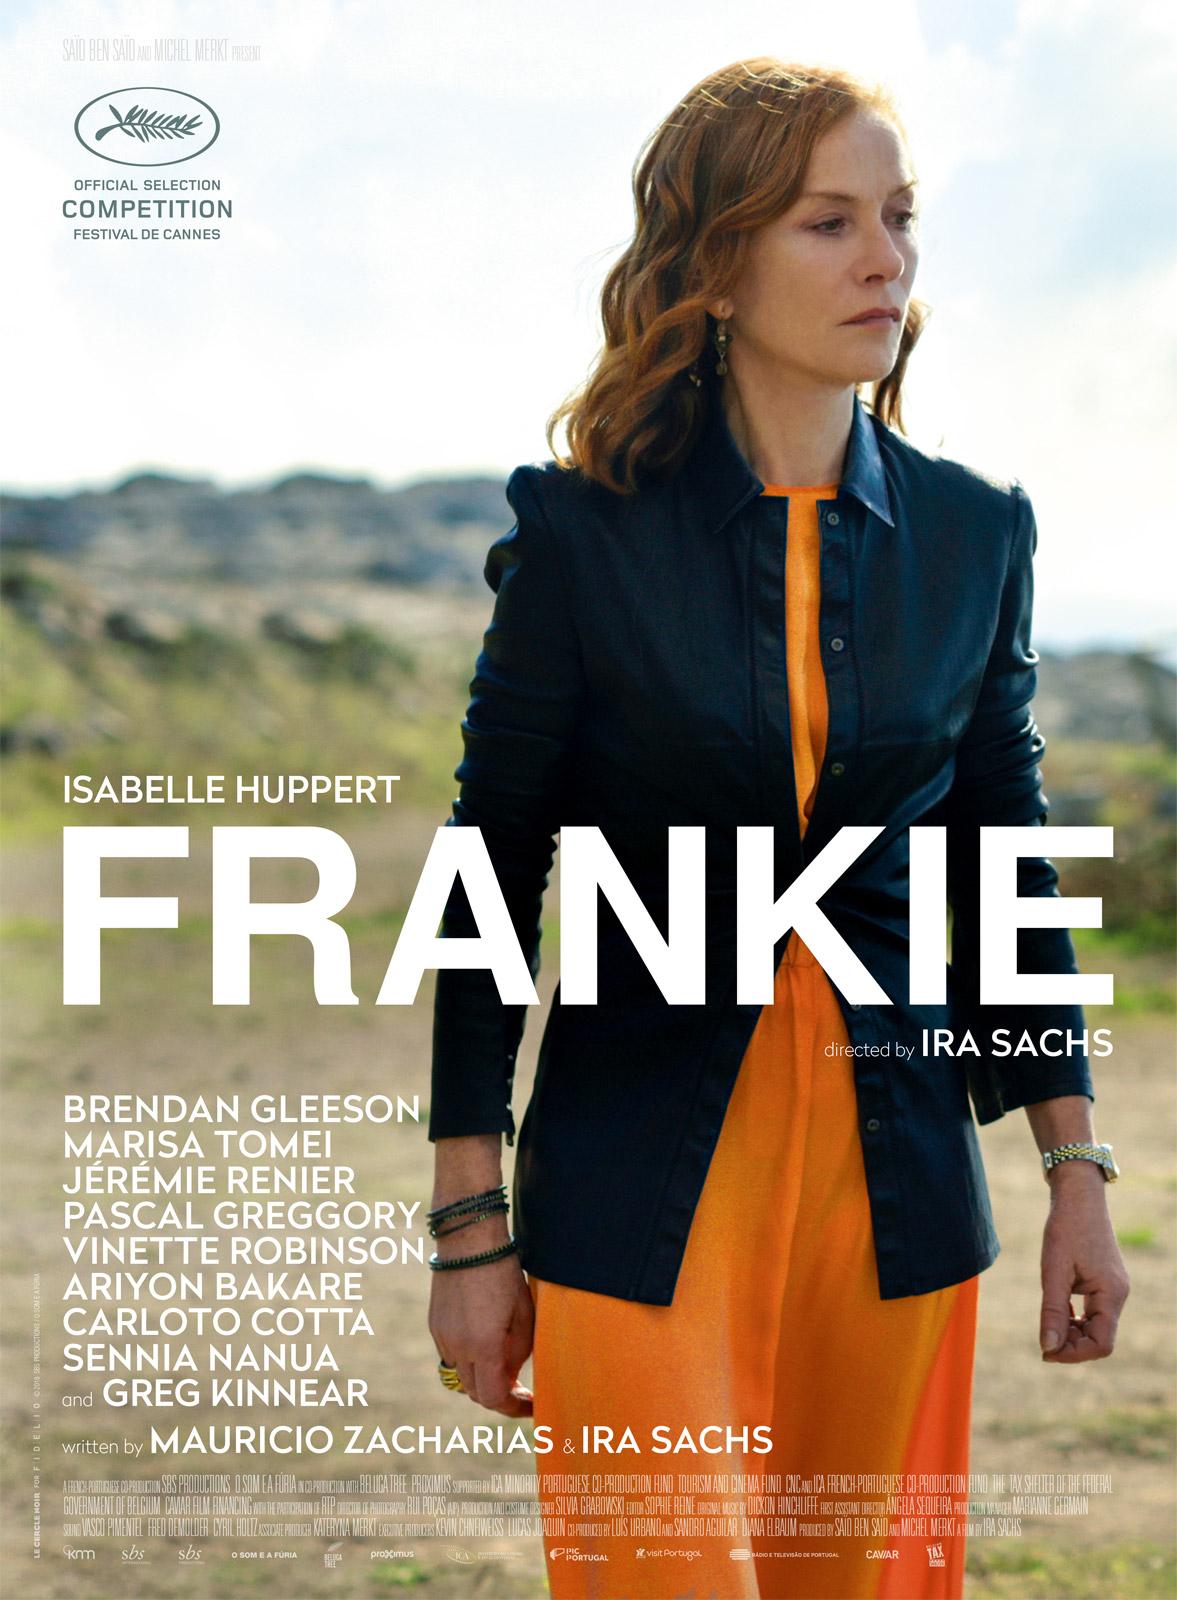 Frankie d'Ira Sachs -